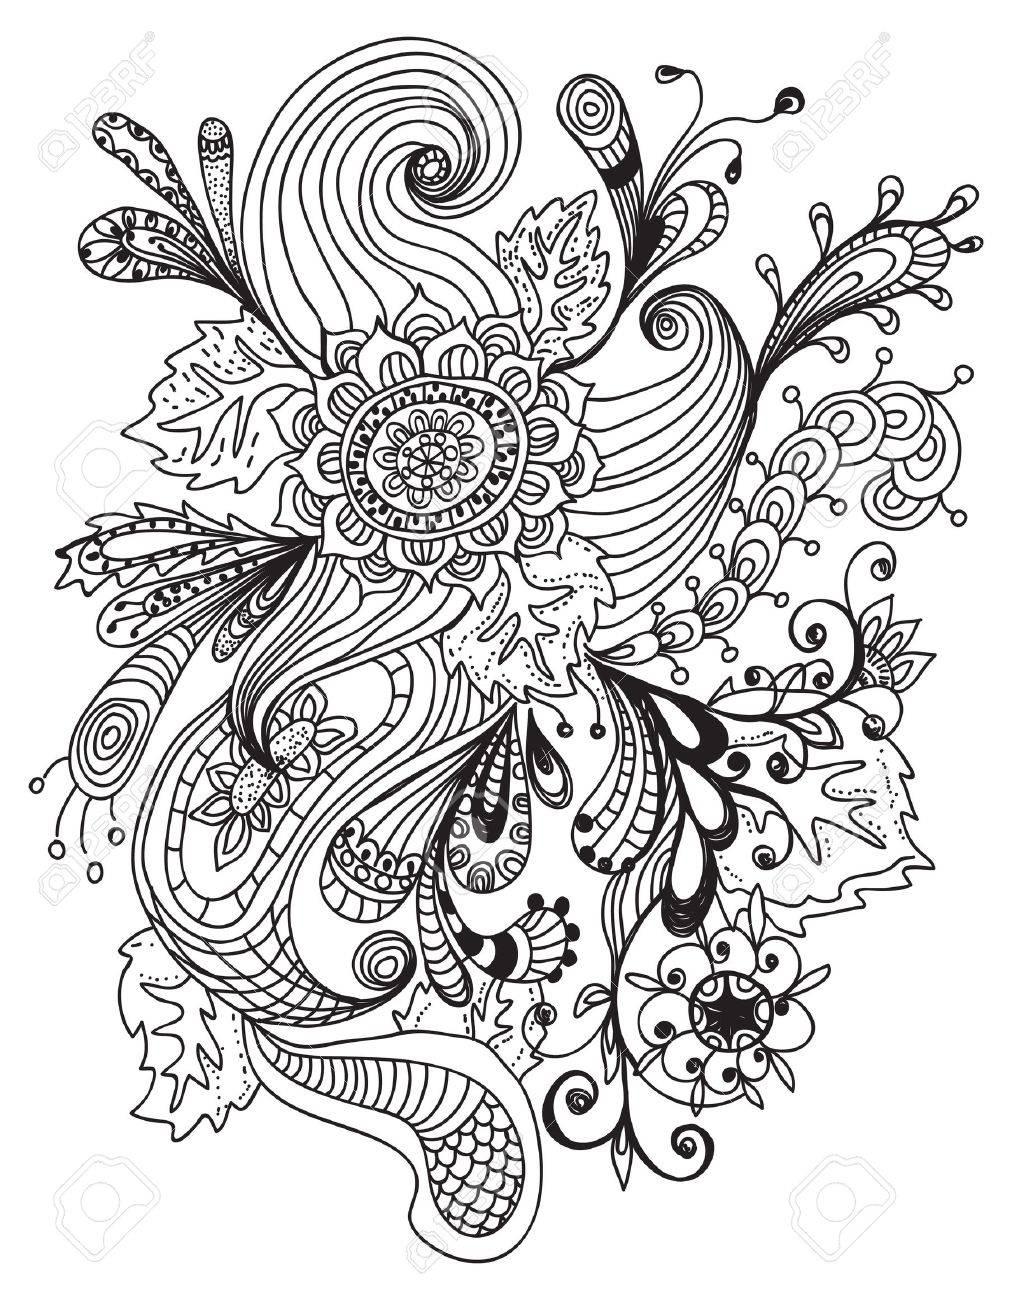 Romantic hand drawn floral ornament, illustration design Stock Vector - 16307253